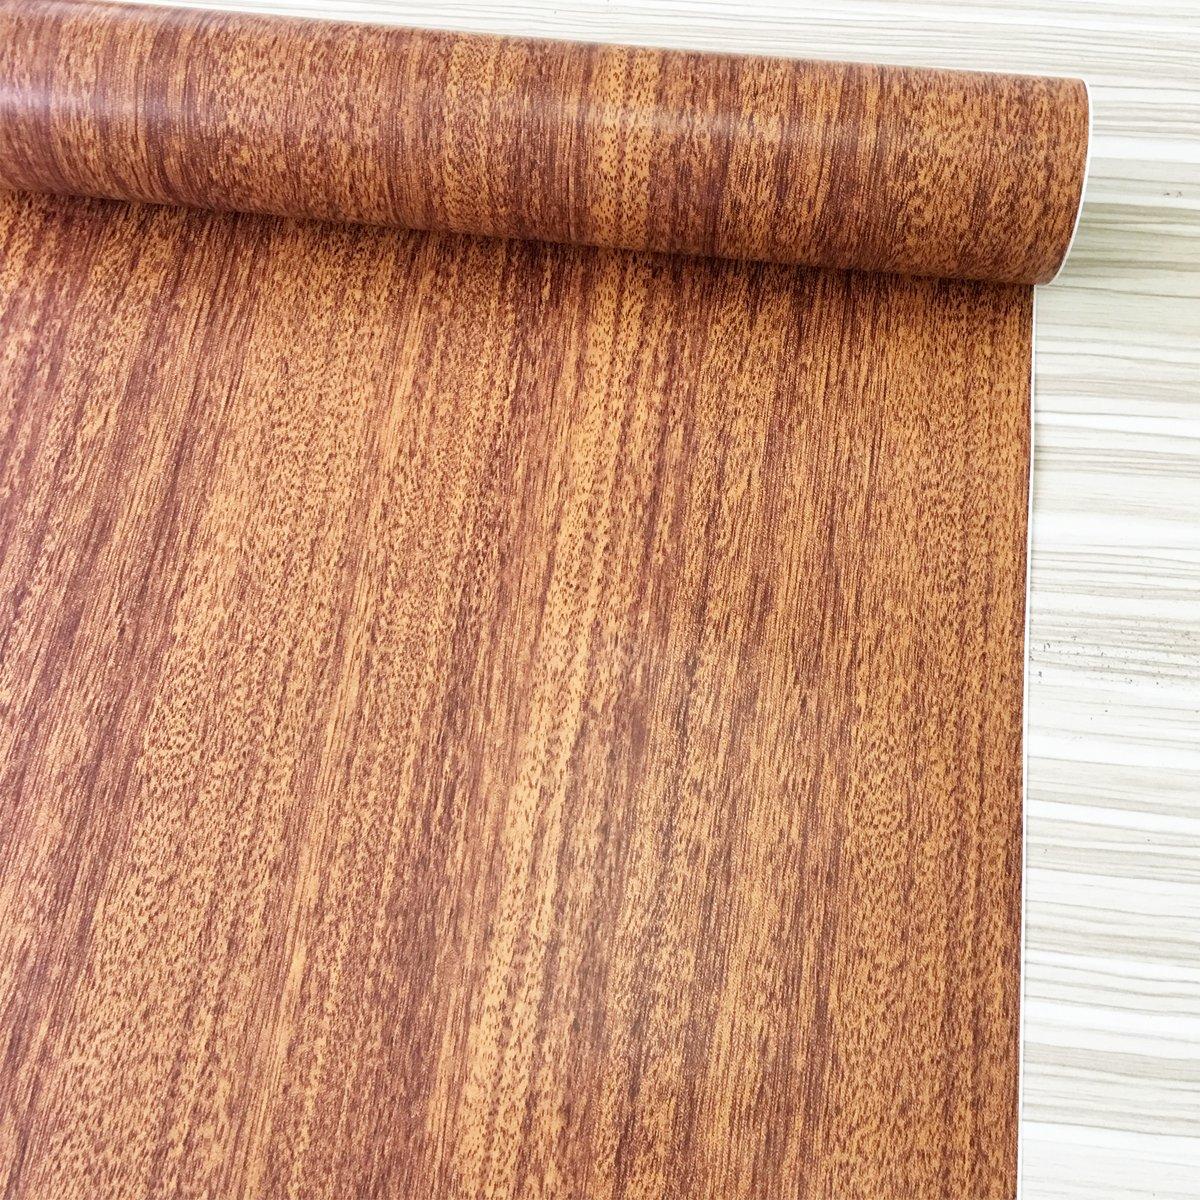 SimpleLife4U Brown Wood Textured Vinyl Contact Paper Self-Adhesive Shelf Liner Countertop Door Sticker 17.7 Inch by 9.8 Feet